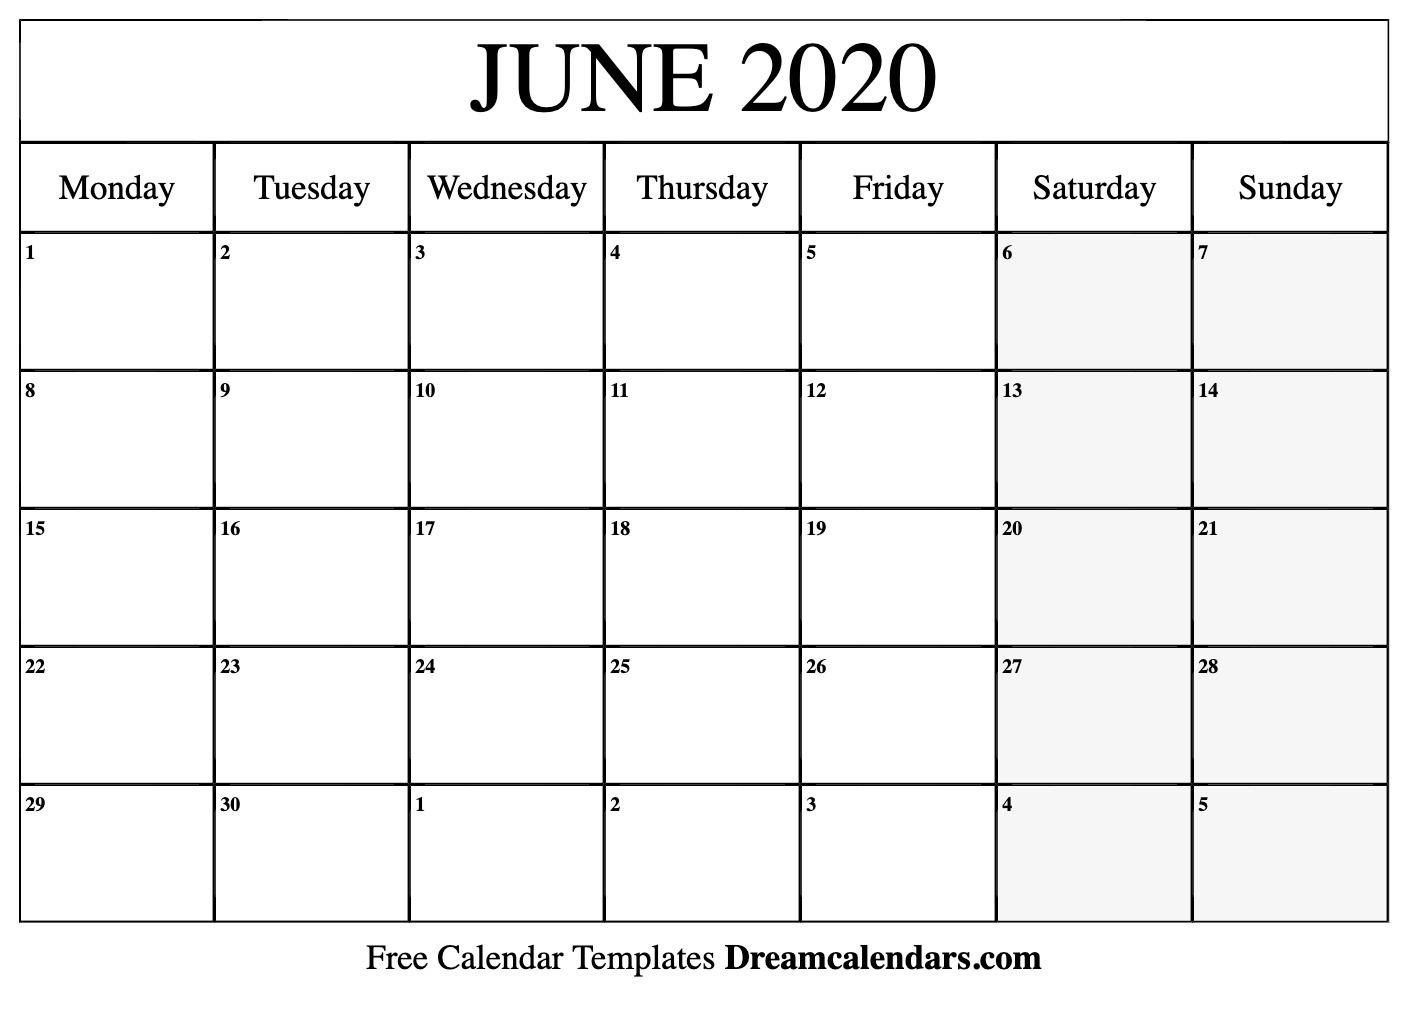 Printable June 2020 Calendar_Blank Calendar Template June 2020